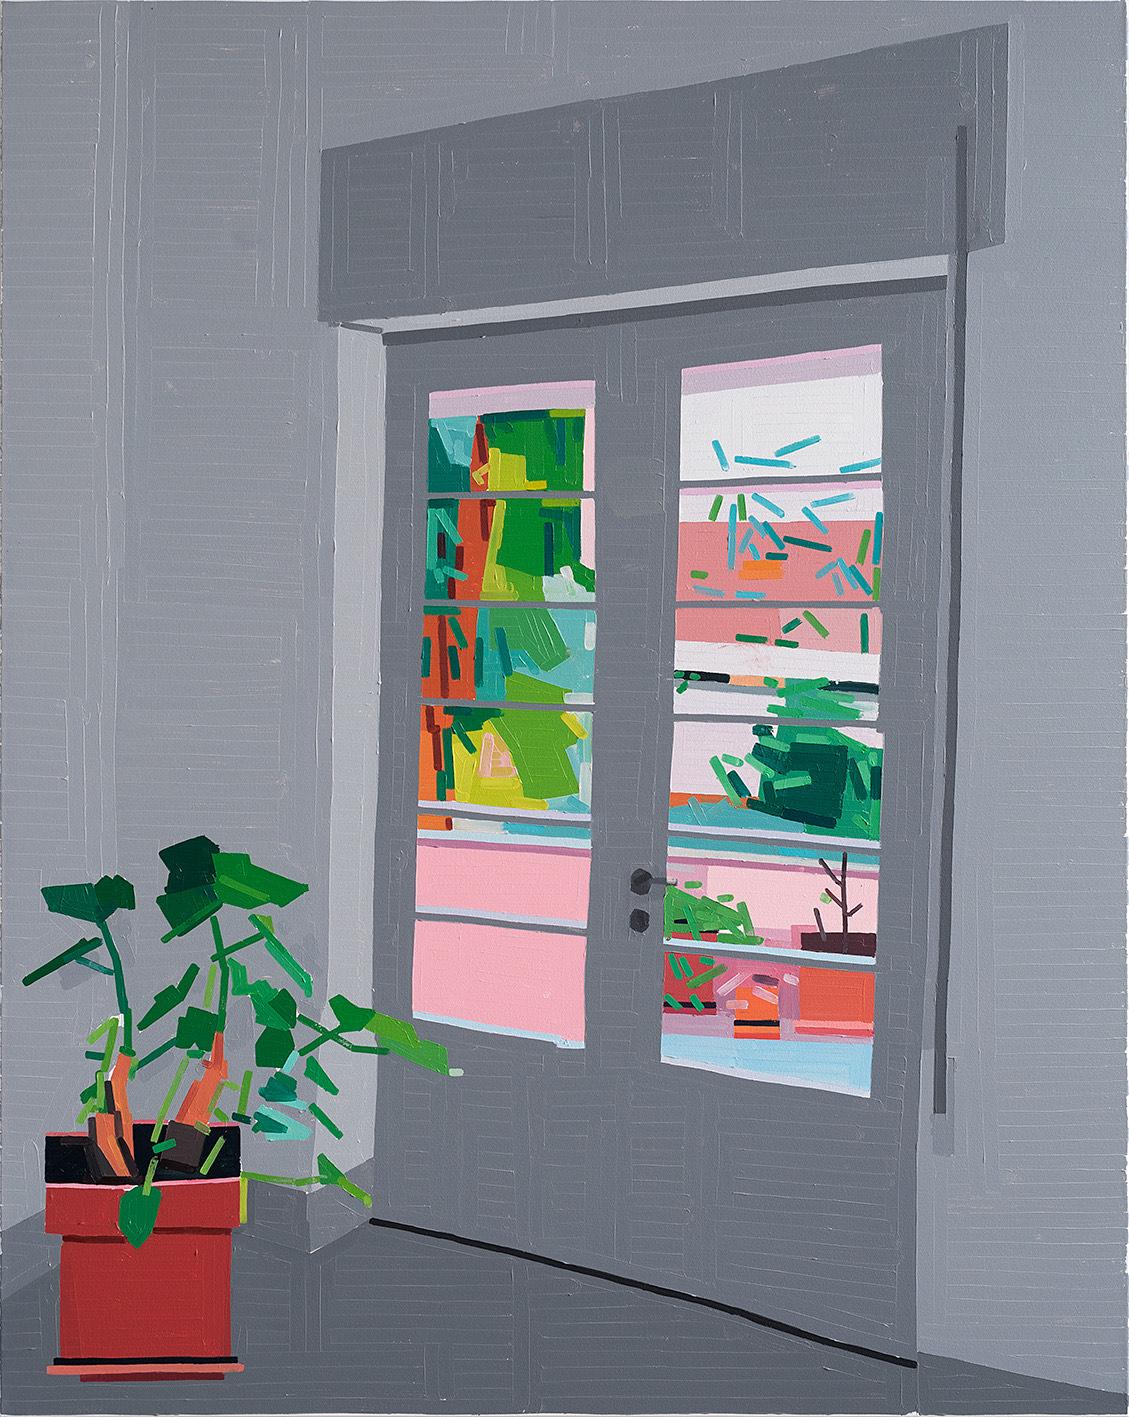 Guy Yanai, Gilboa Balcony Door 2019, Oil on canvas 150 x 120 cm